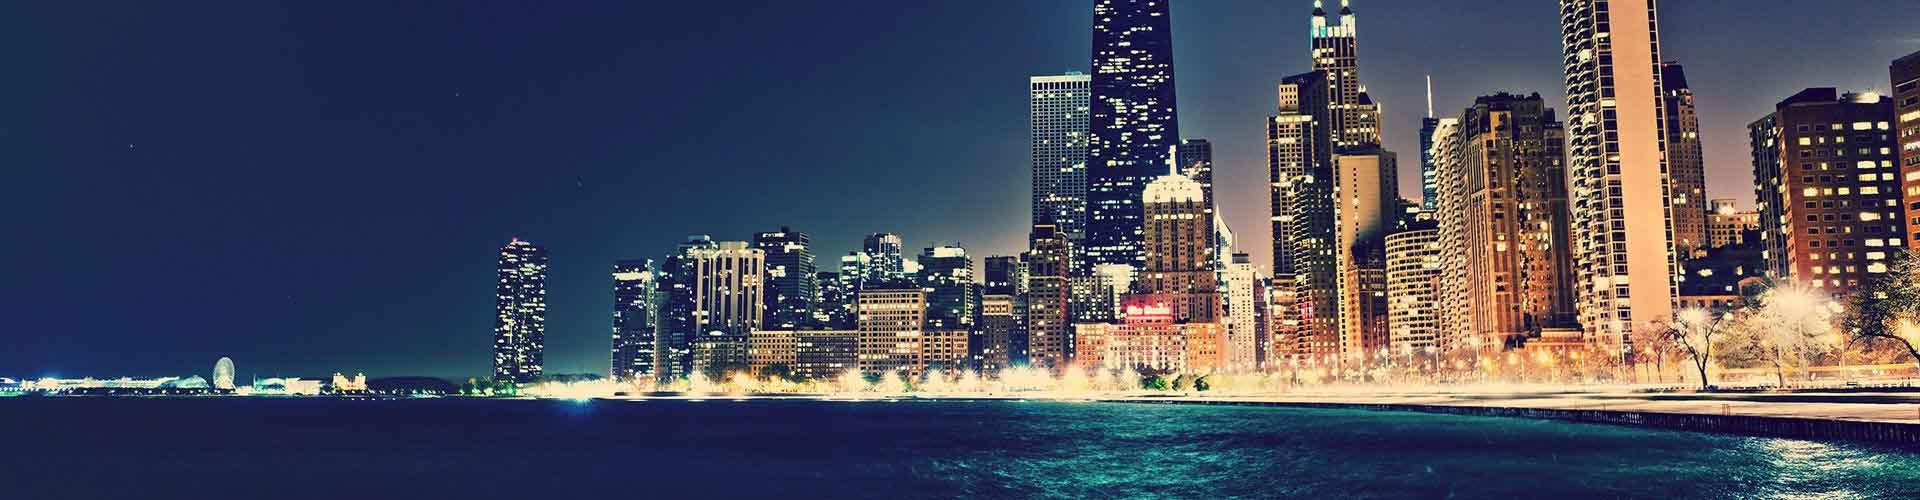 Chicago - Hostelů v Chicago. Mapy pro Chicago, fotky a recenze pro každý hostel v Chicago.